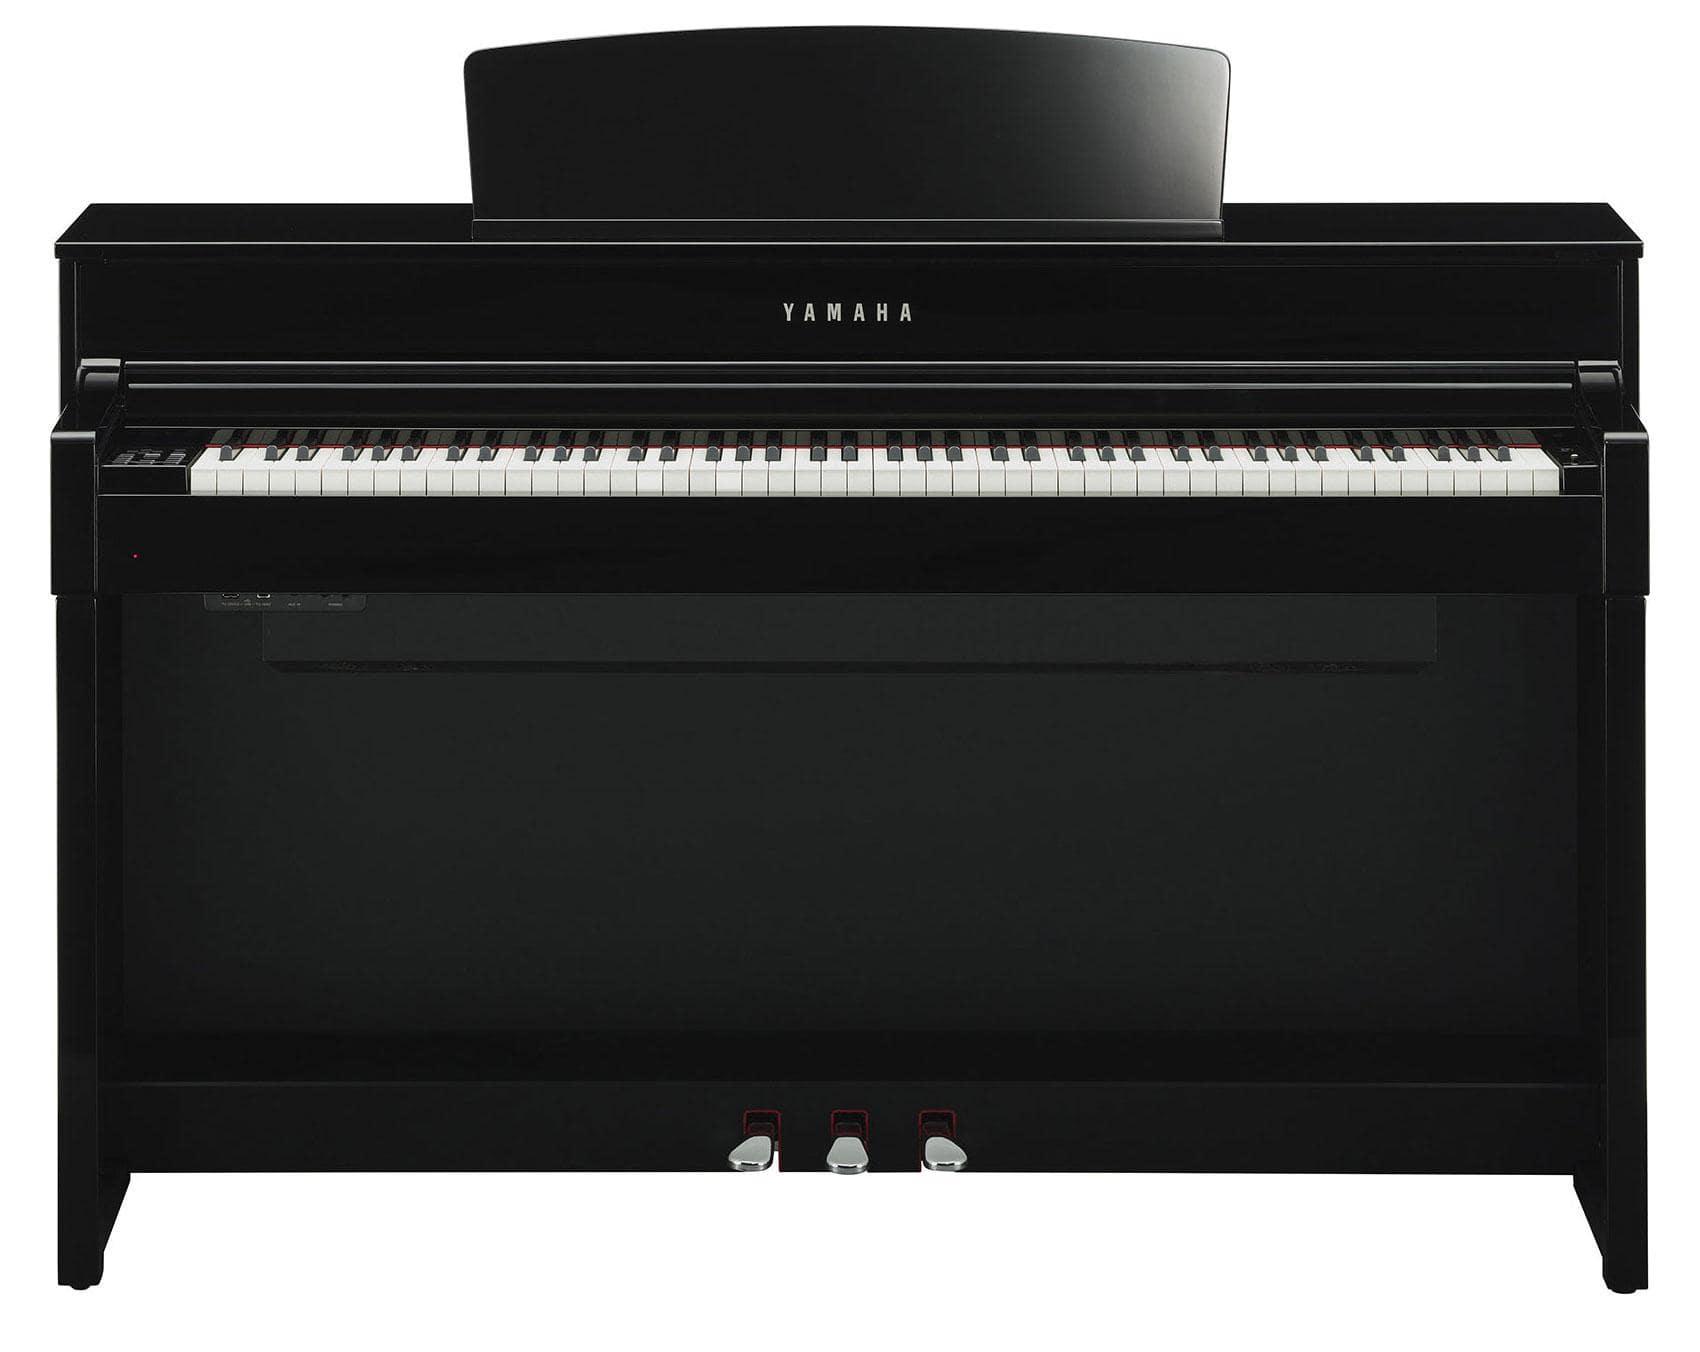 yamaha clp 575 pe digitalpiano schwarz hochglanz. Black Bedroom Furniture Sets. Home Design Ideas